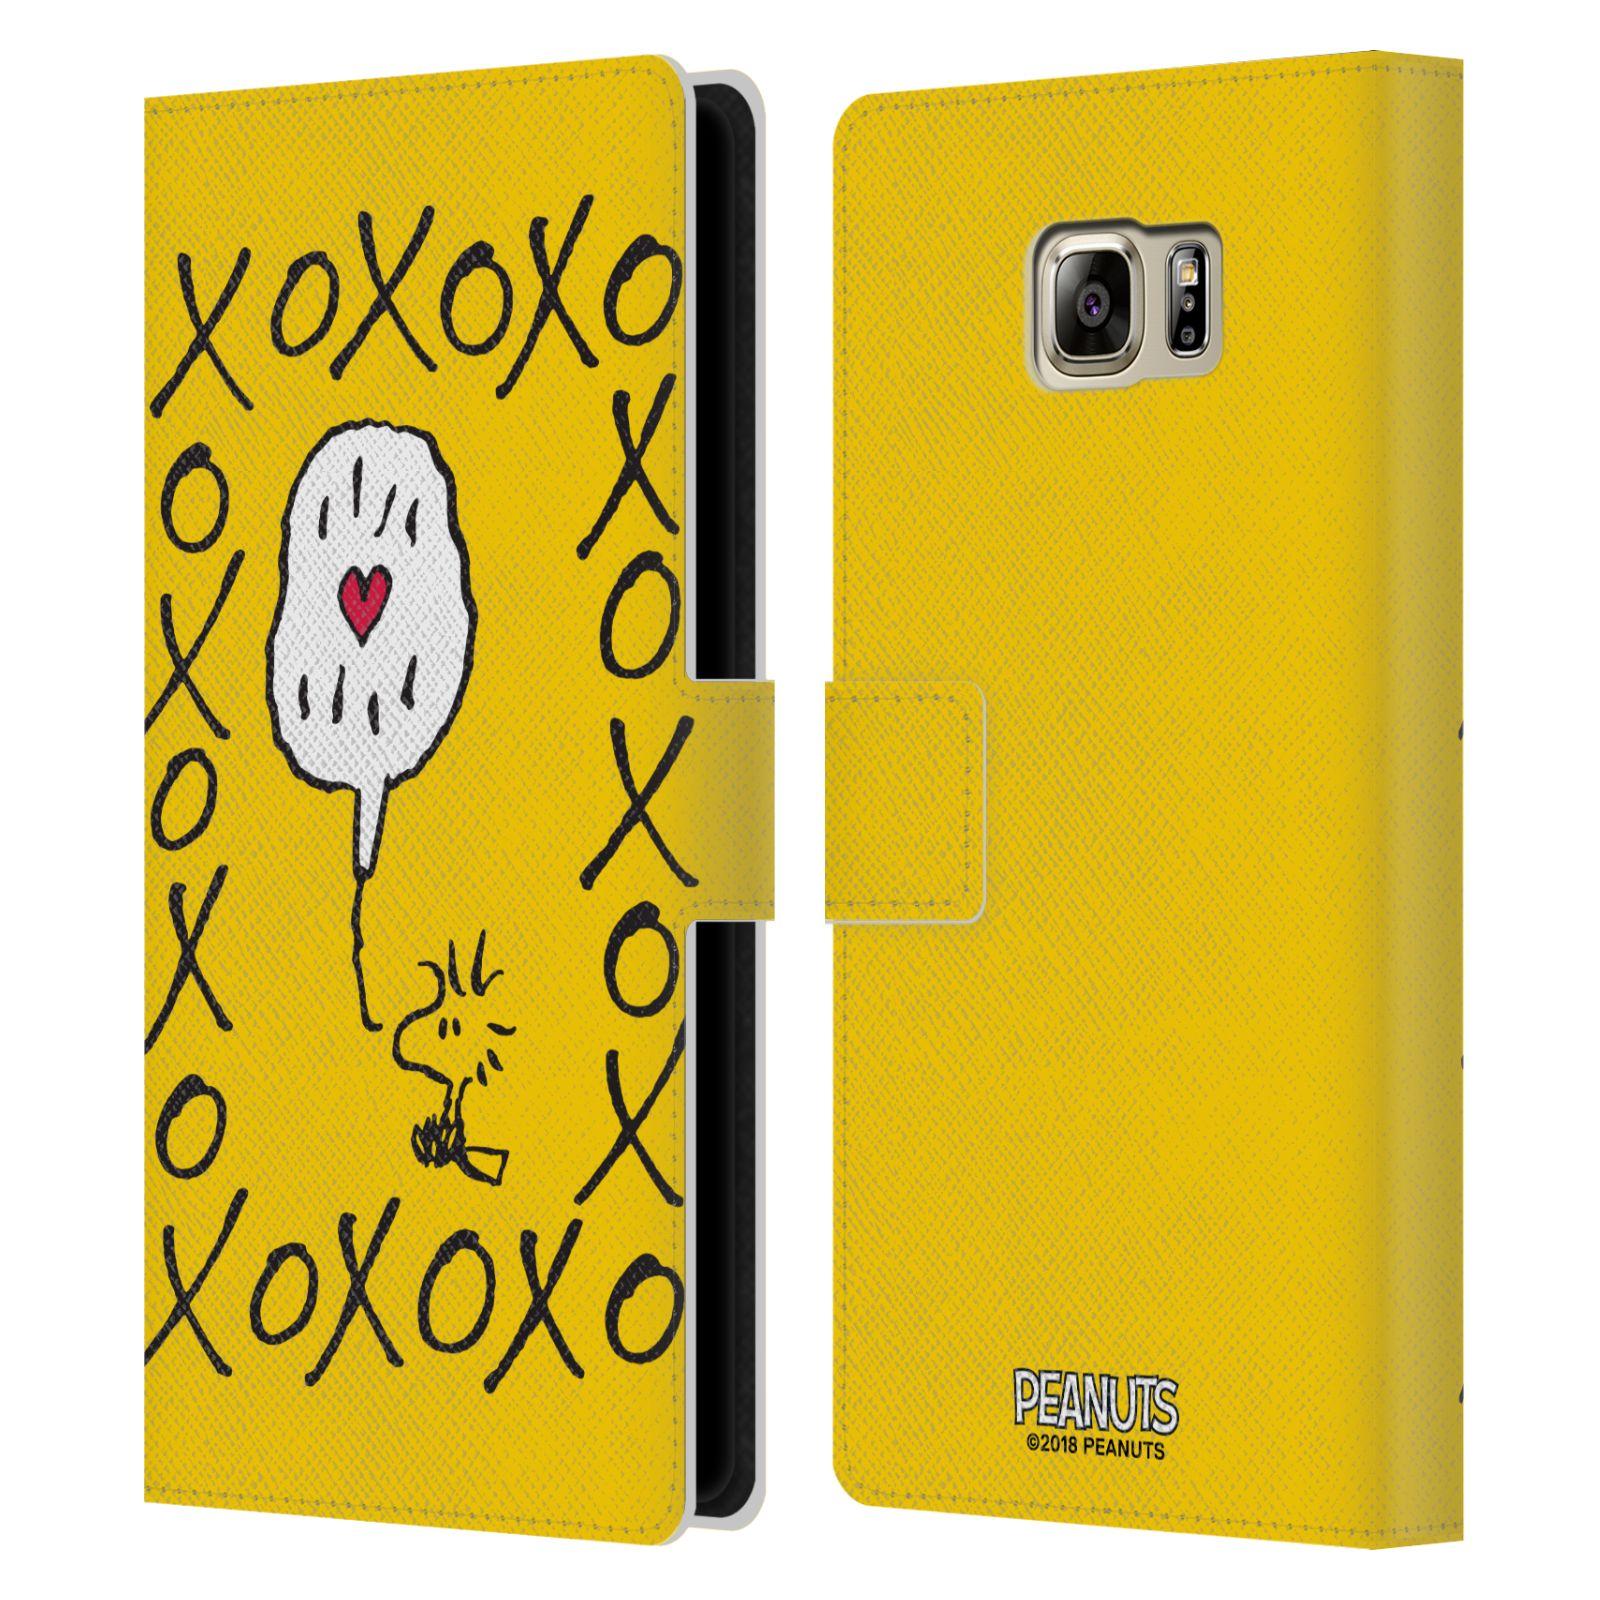 Pouzdro na mobil Samsung Galaxy NOTE 5 - Head Case - Peanuts - Woodstock ptáček XOXO